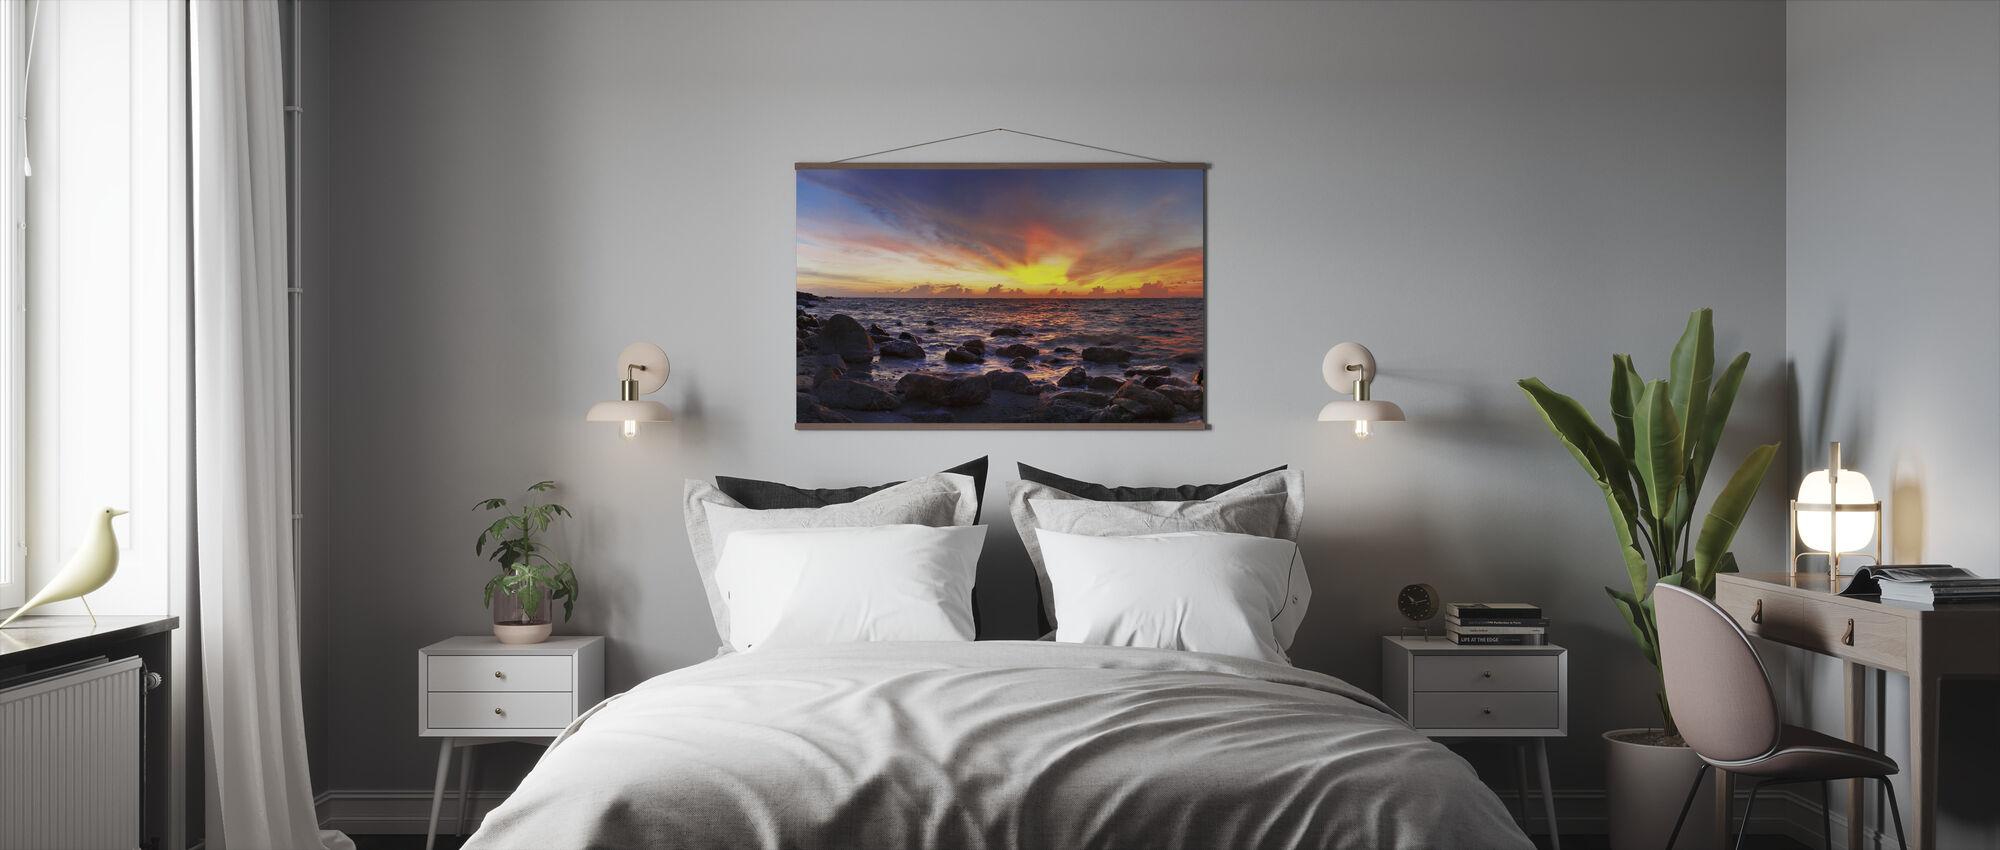 Wild Sunset - Poster - Bedroom